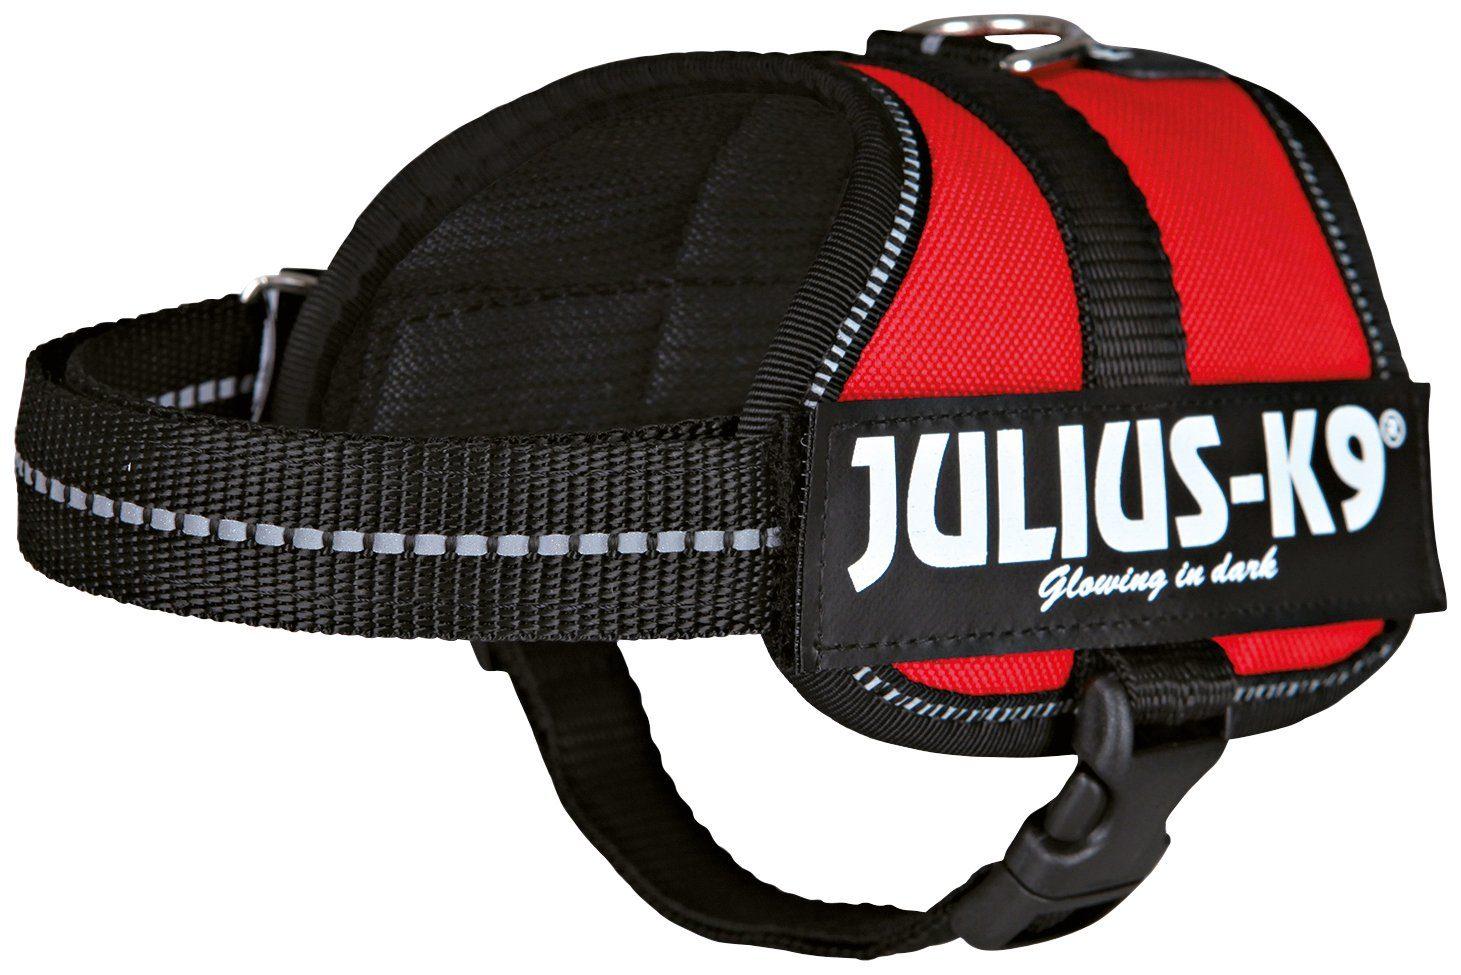 Hunde-Geschirr »Julius-K9 Mini/M«, rot, 51-67 cm